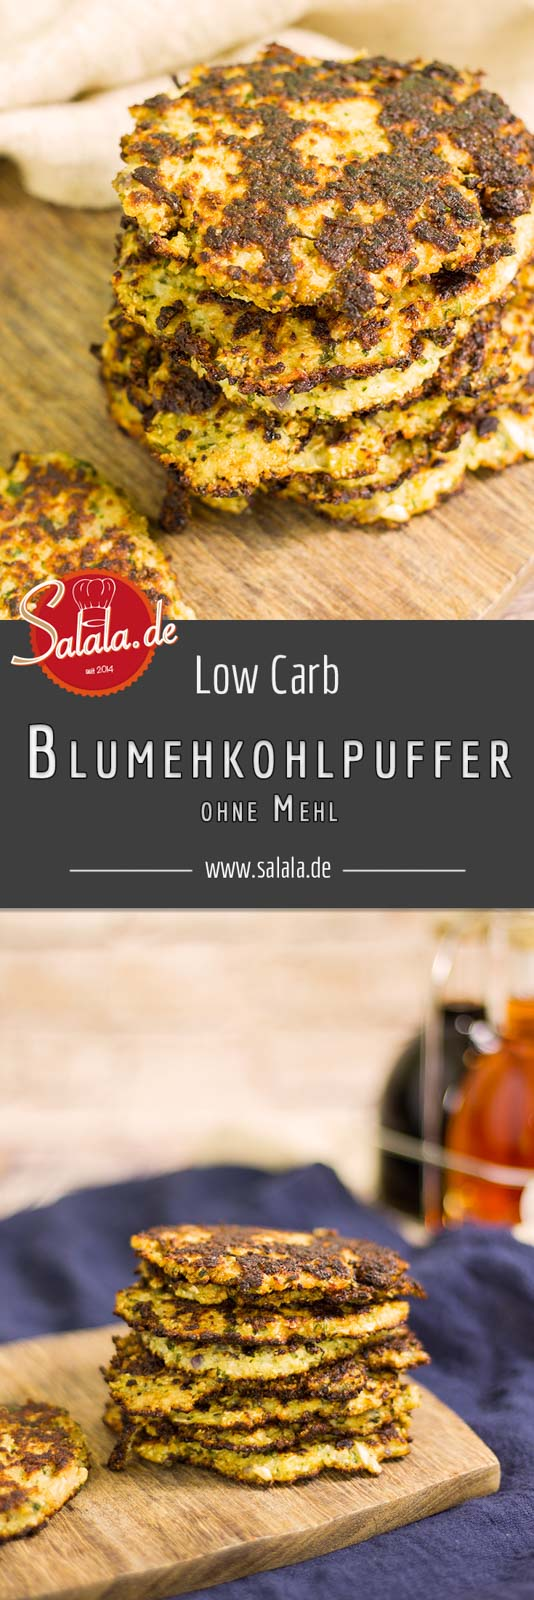 Blumenkohlpuffer selber machen - by salala.de - Low Carb Rezept ohne Mehl